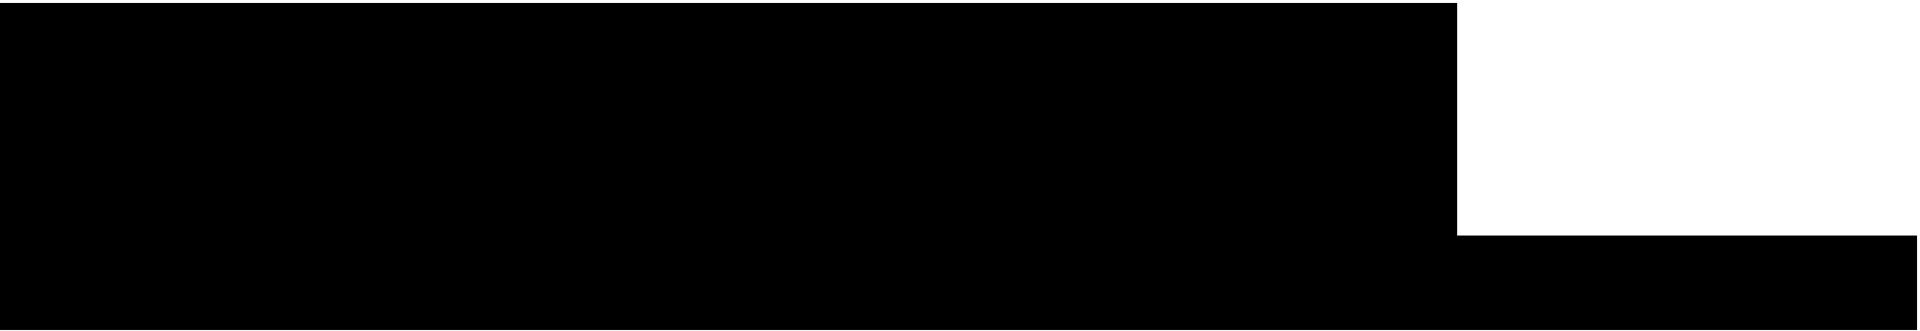 sangria-rouge